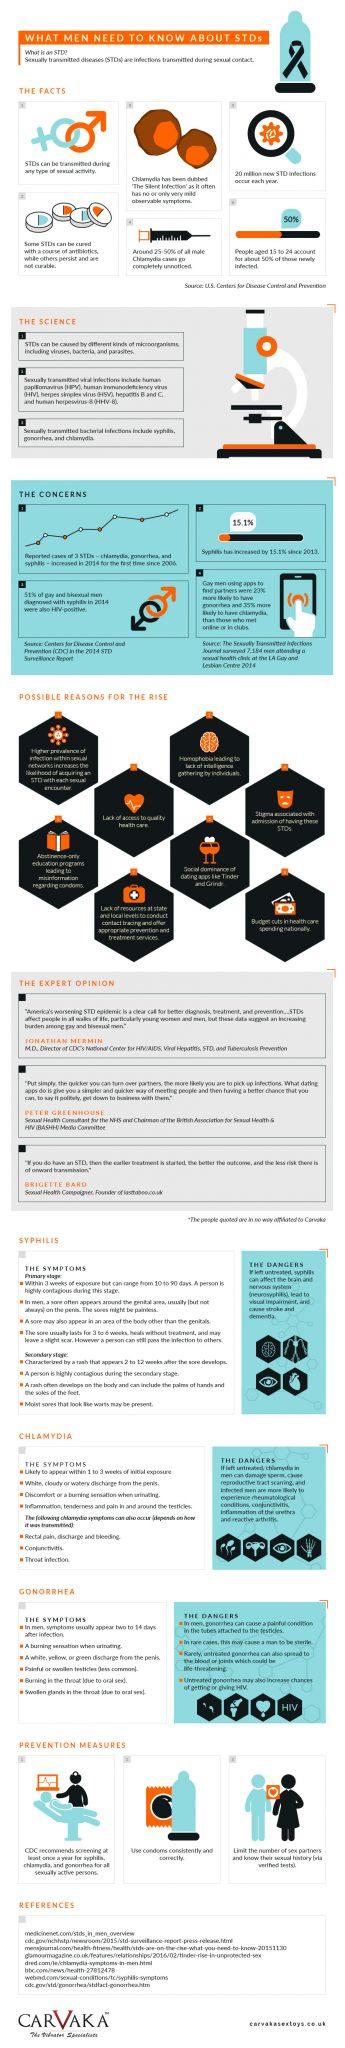 STD infographic